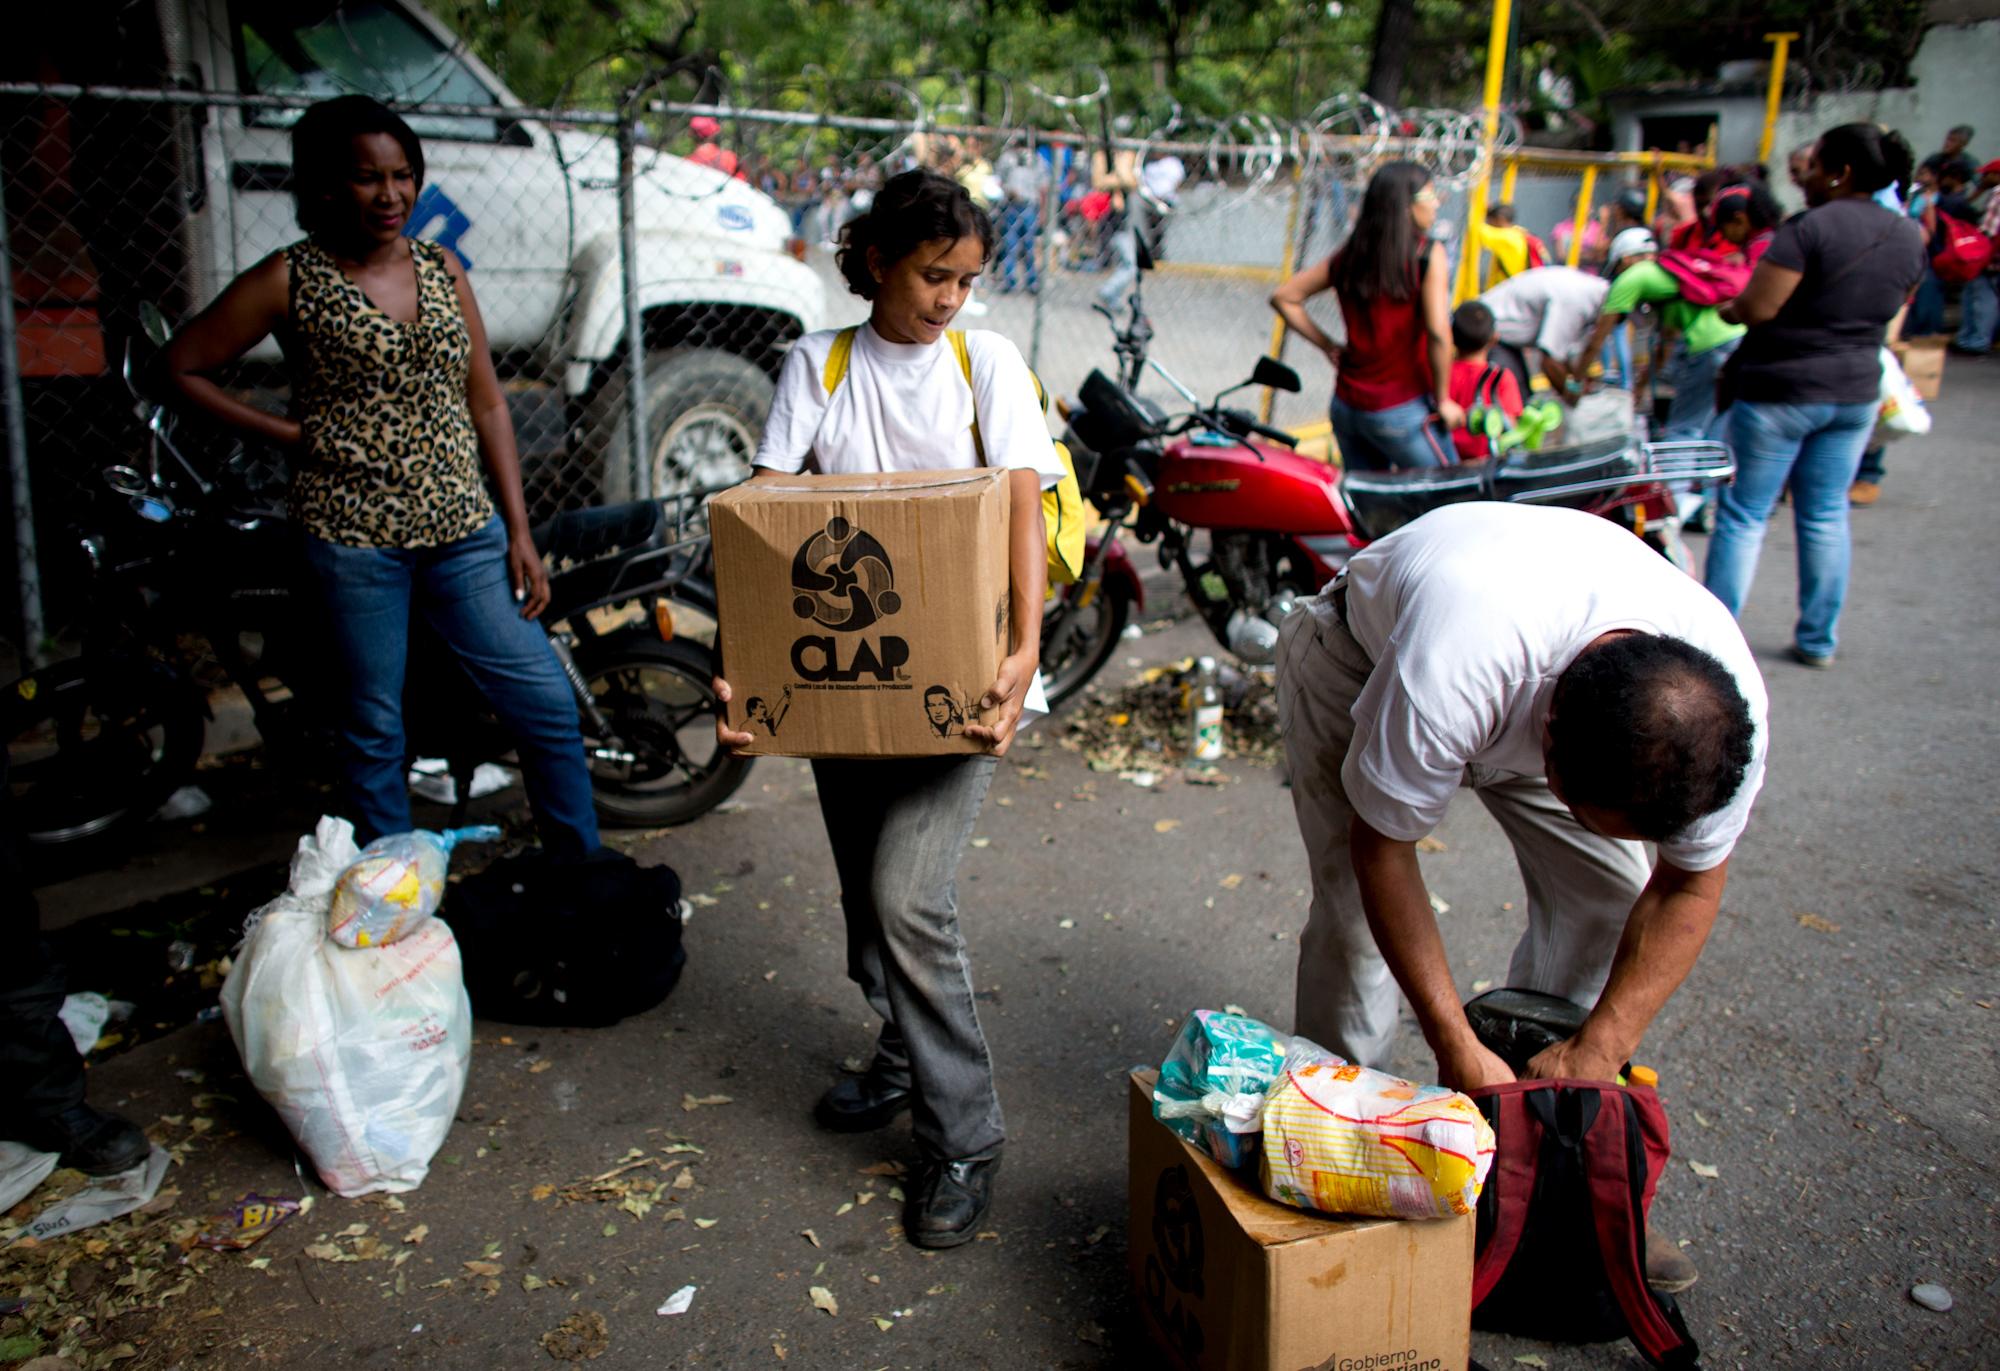 US Sanctions Cost Venezuela $6B Since August 2017, Sparking Humanitarian Catastrophe